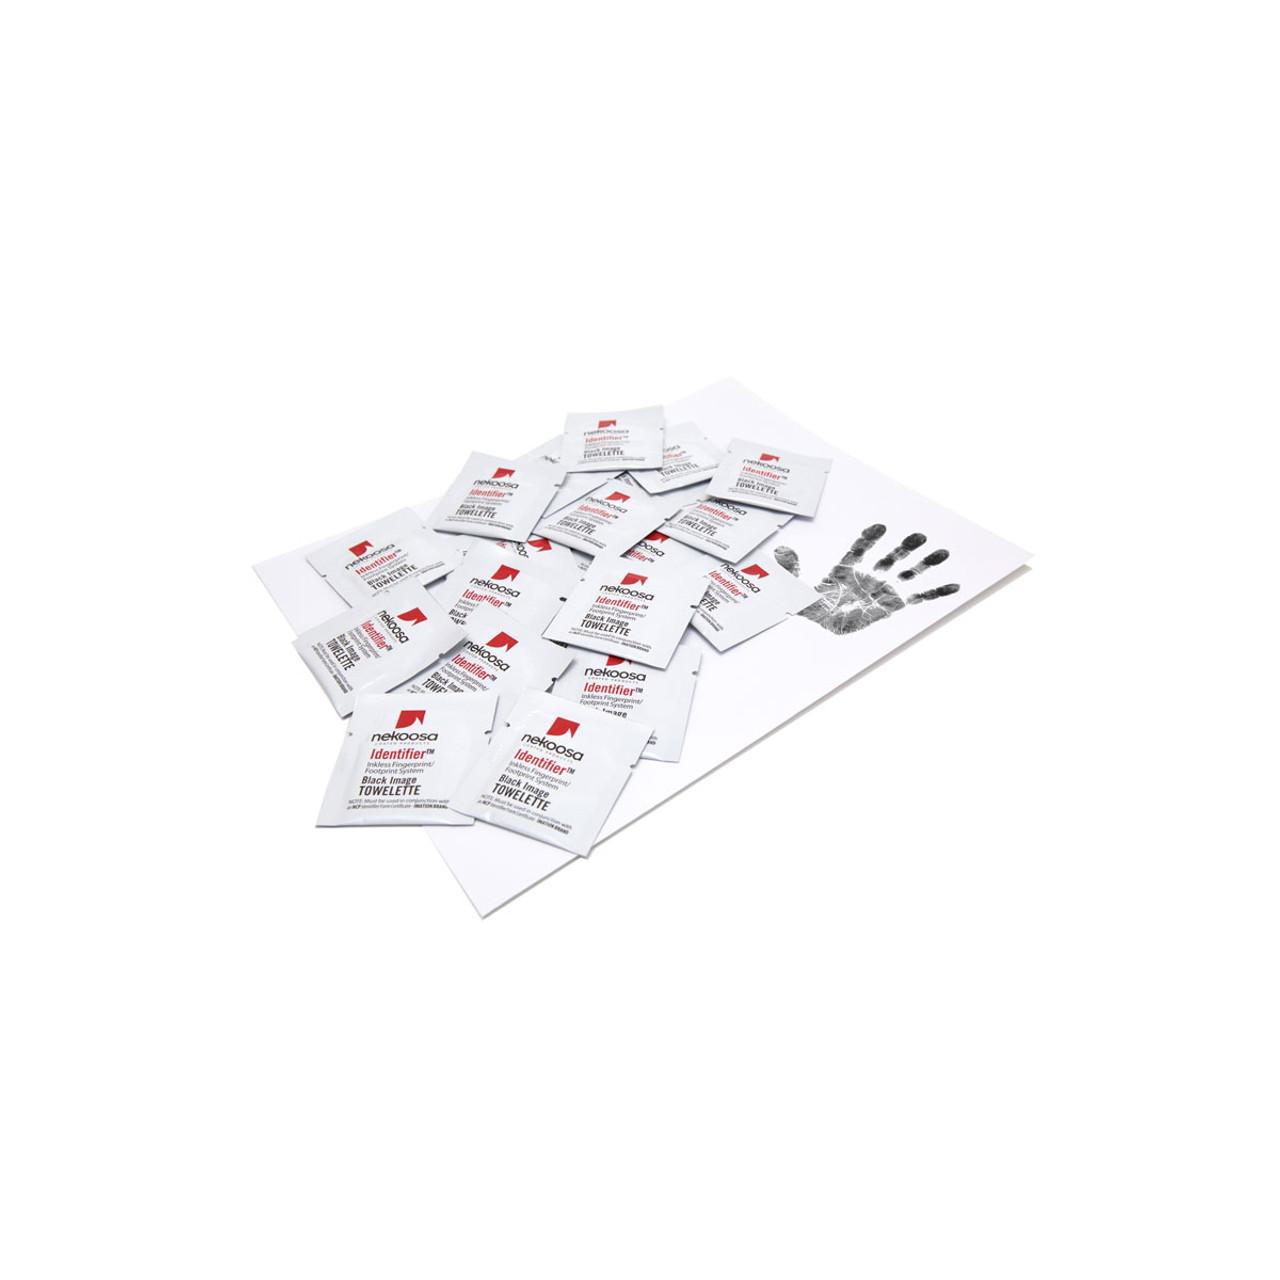 Inkless Print Set - 50 wipes + 50 papers